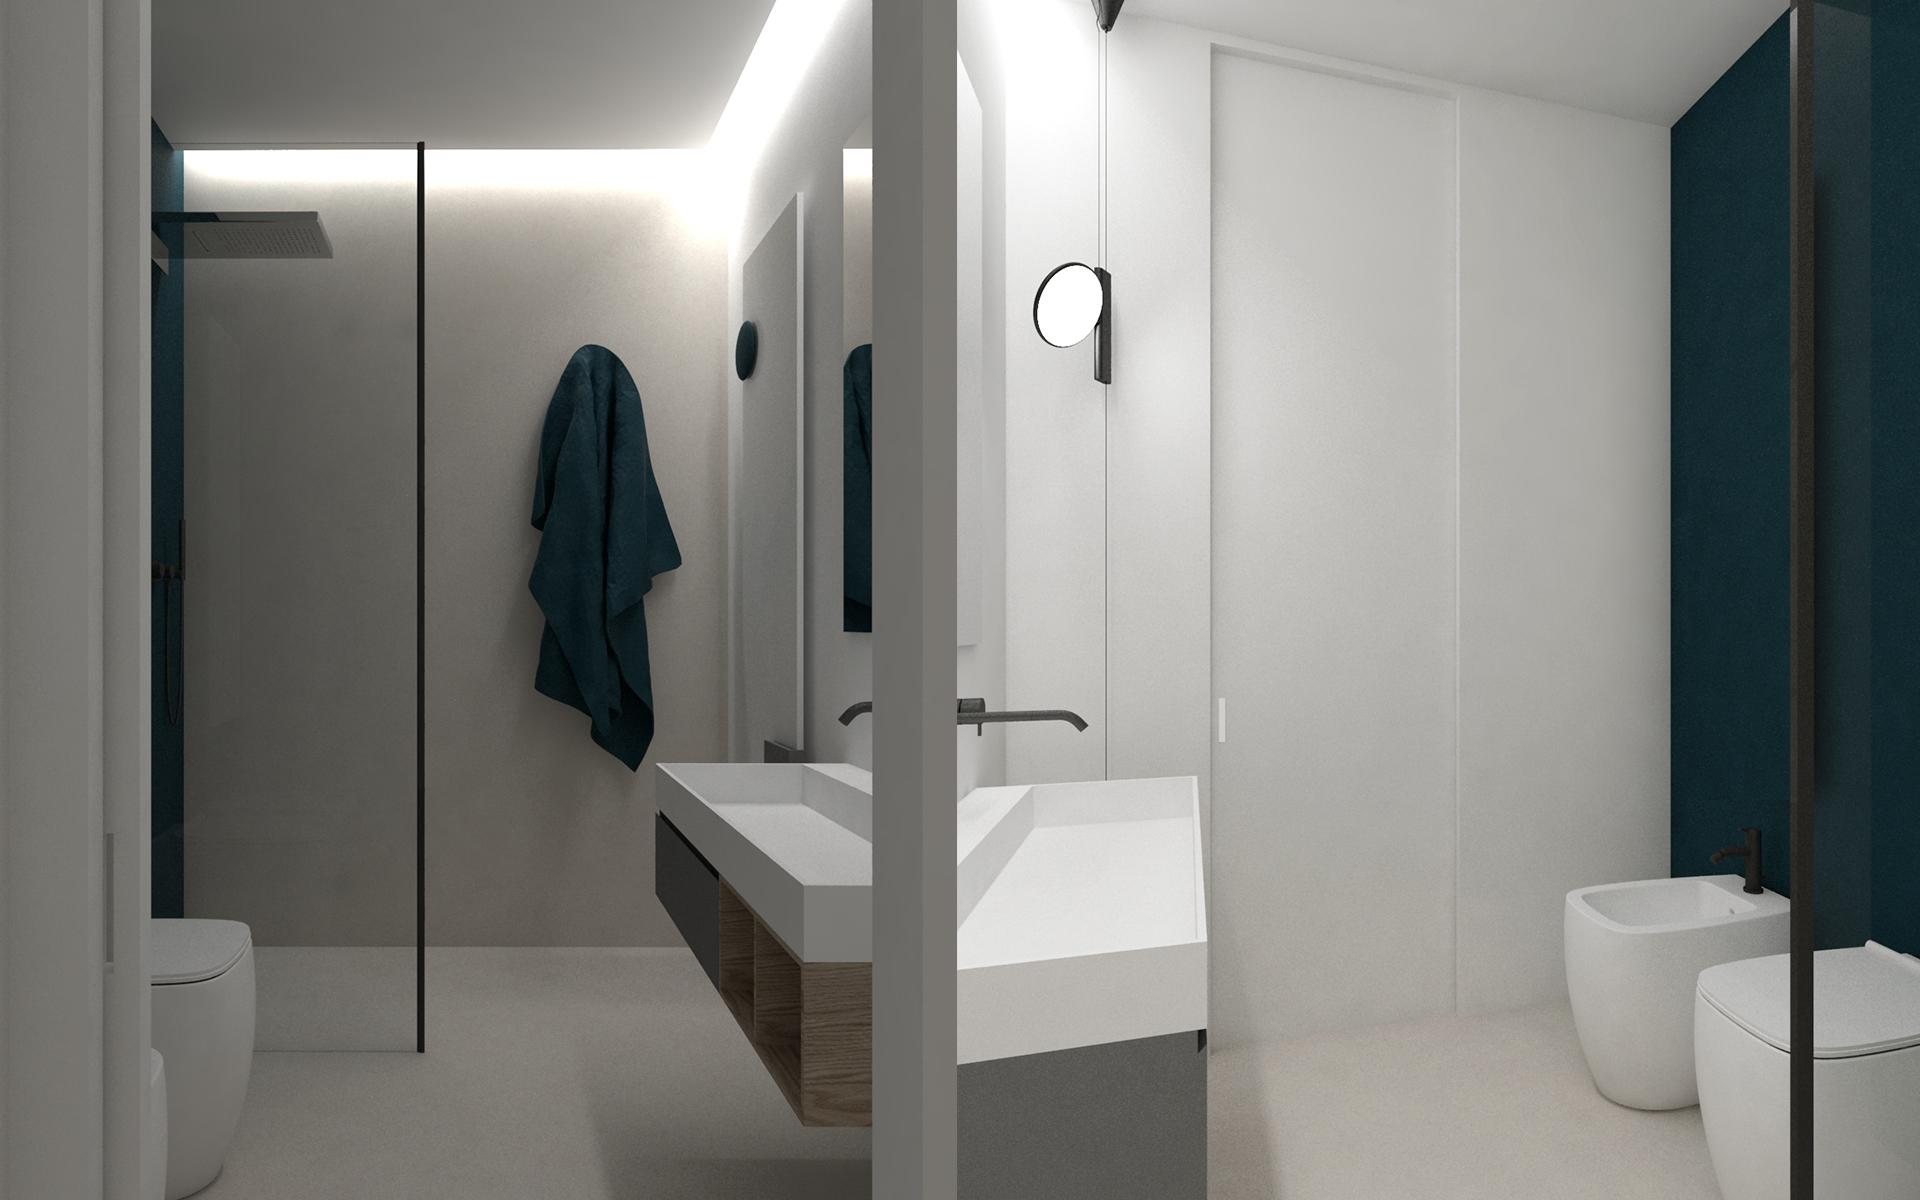 Casa-MR-_-DFG-Architetti-Associati-8